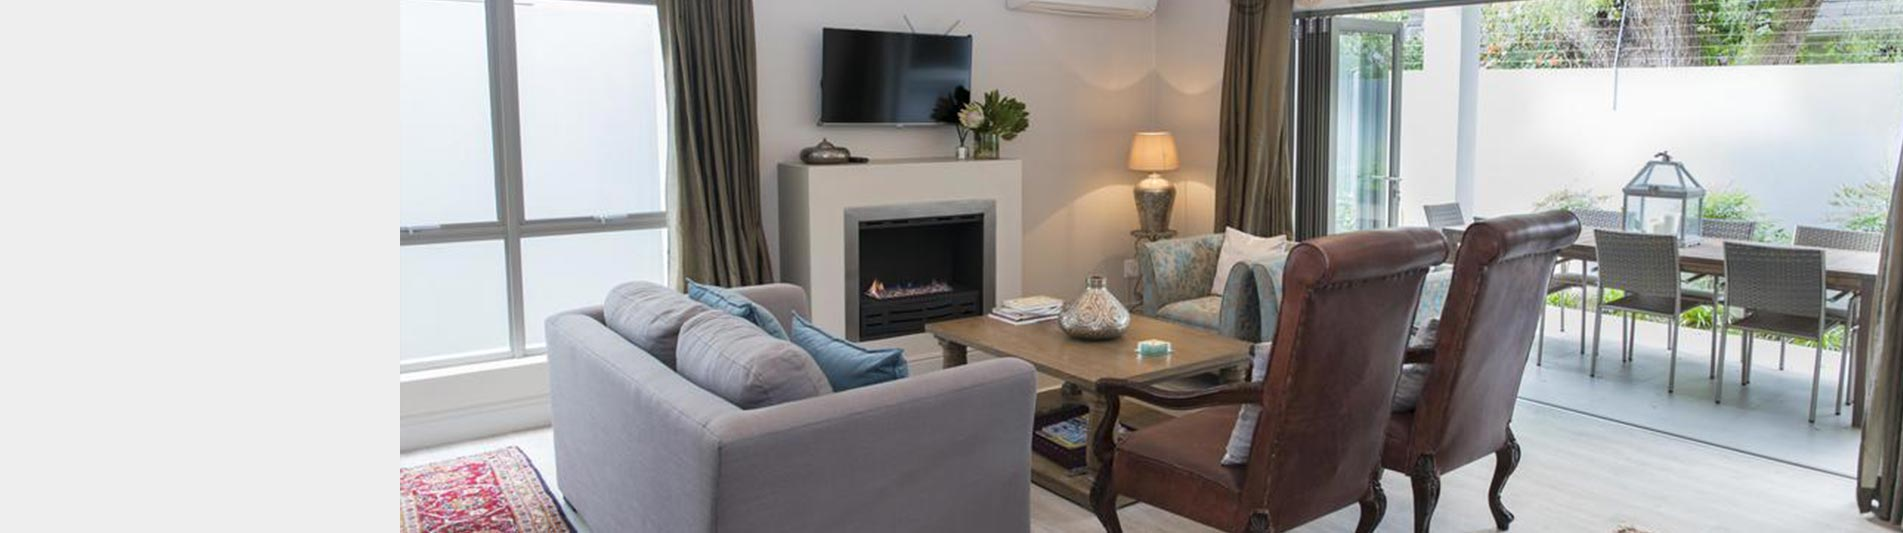 Luxury Apartments - La Gratitude